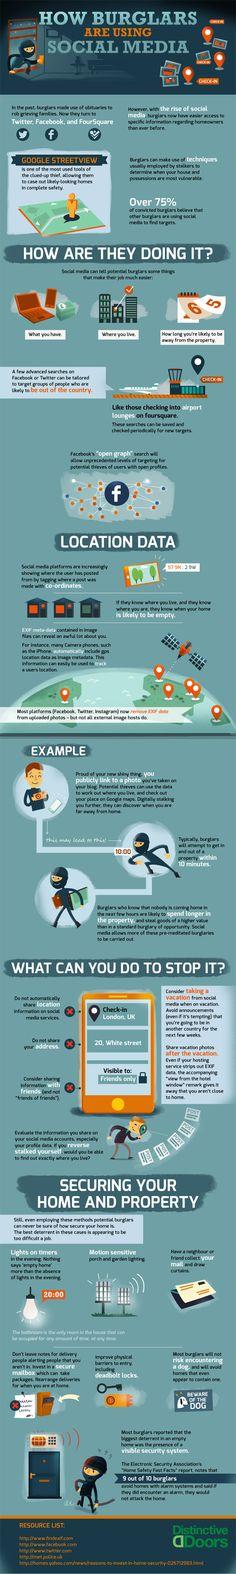 How Burglars Are Using Social Media